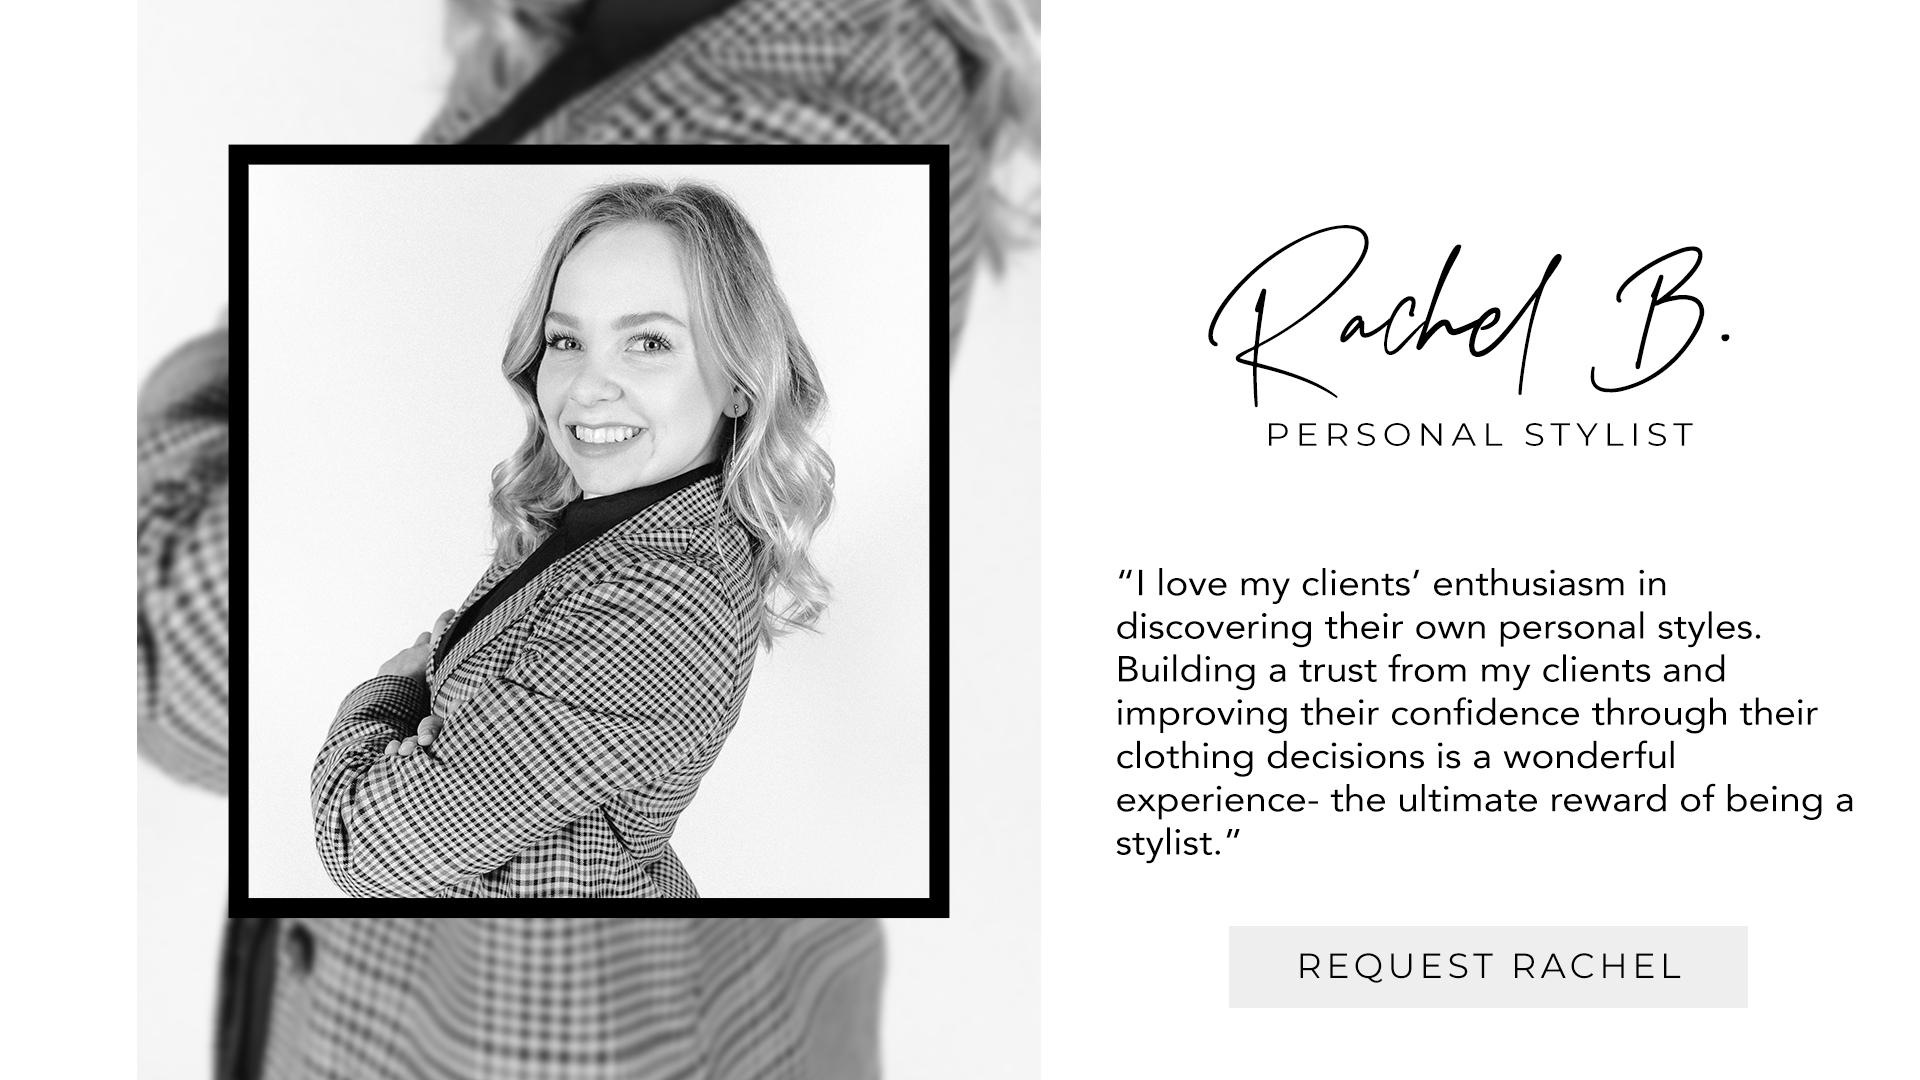 Stylist Rachel B